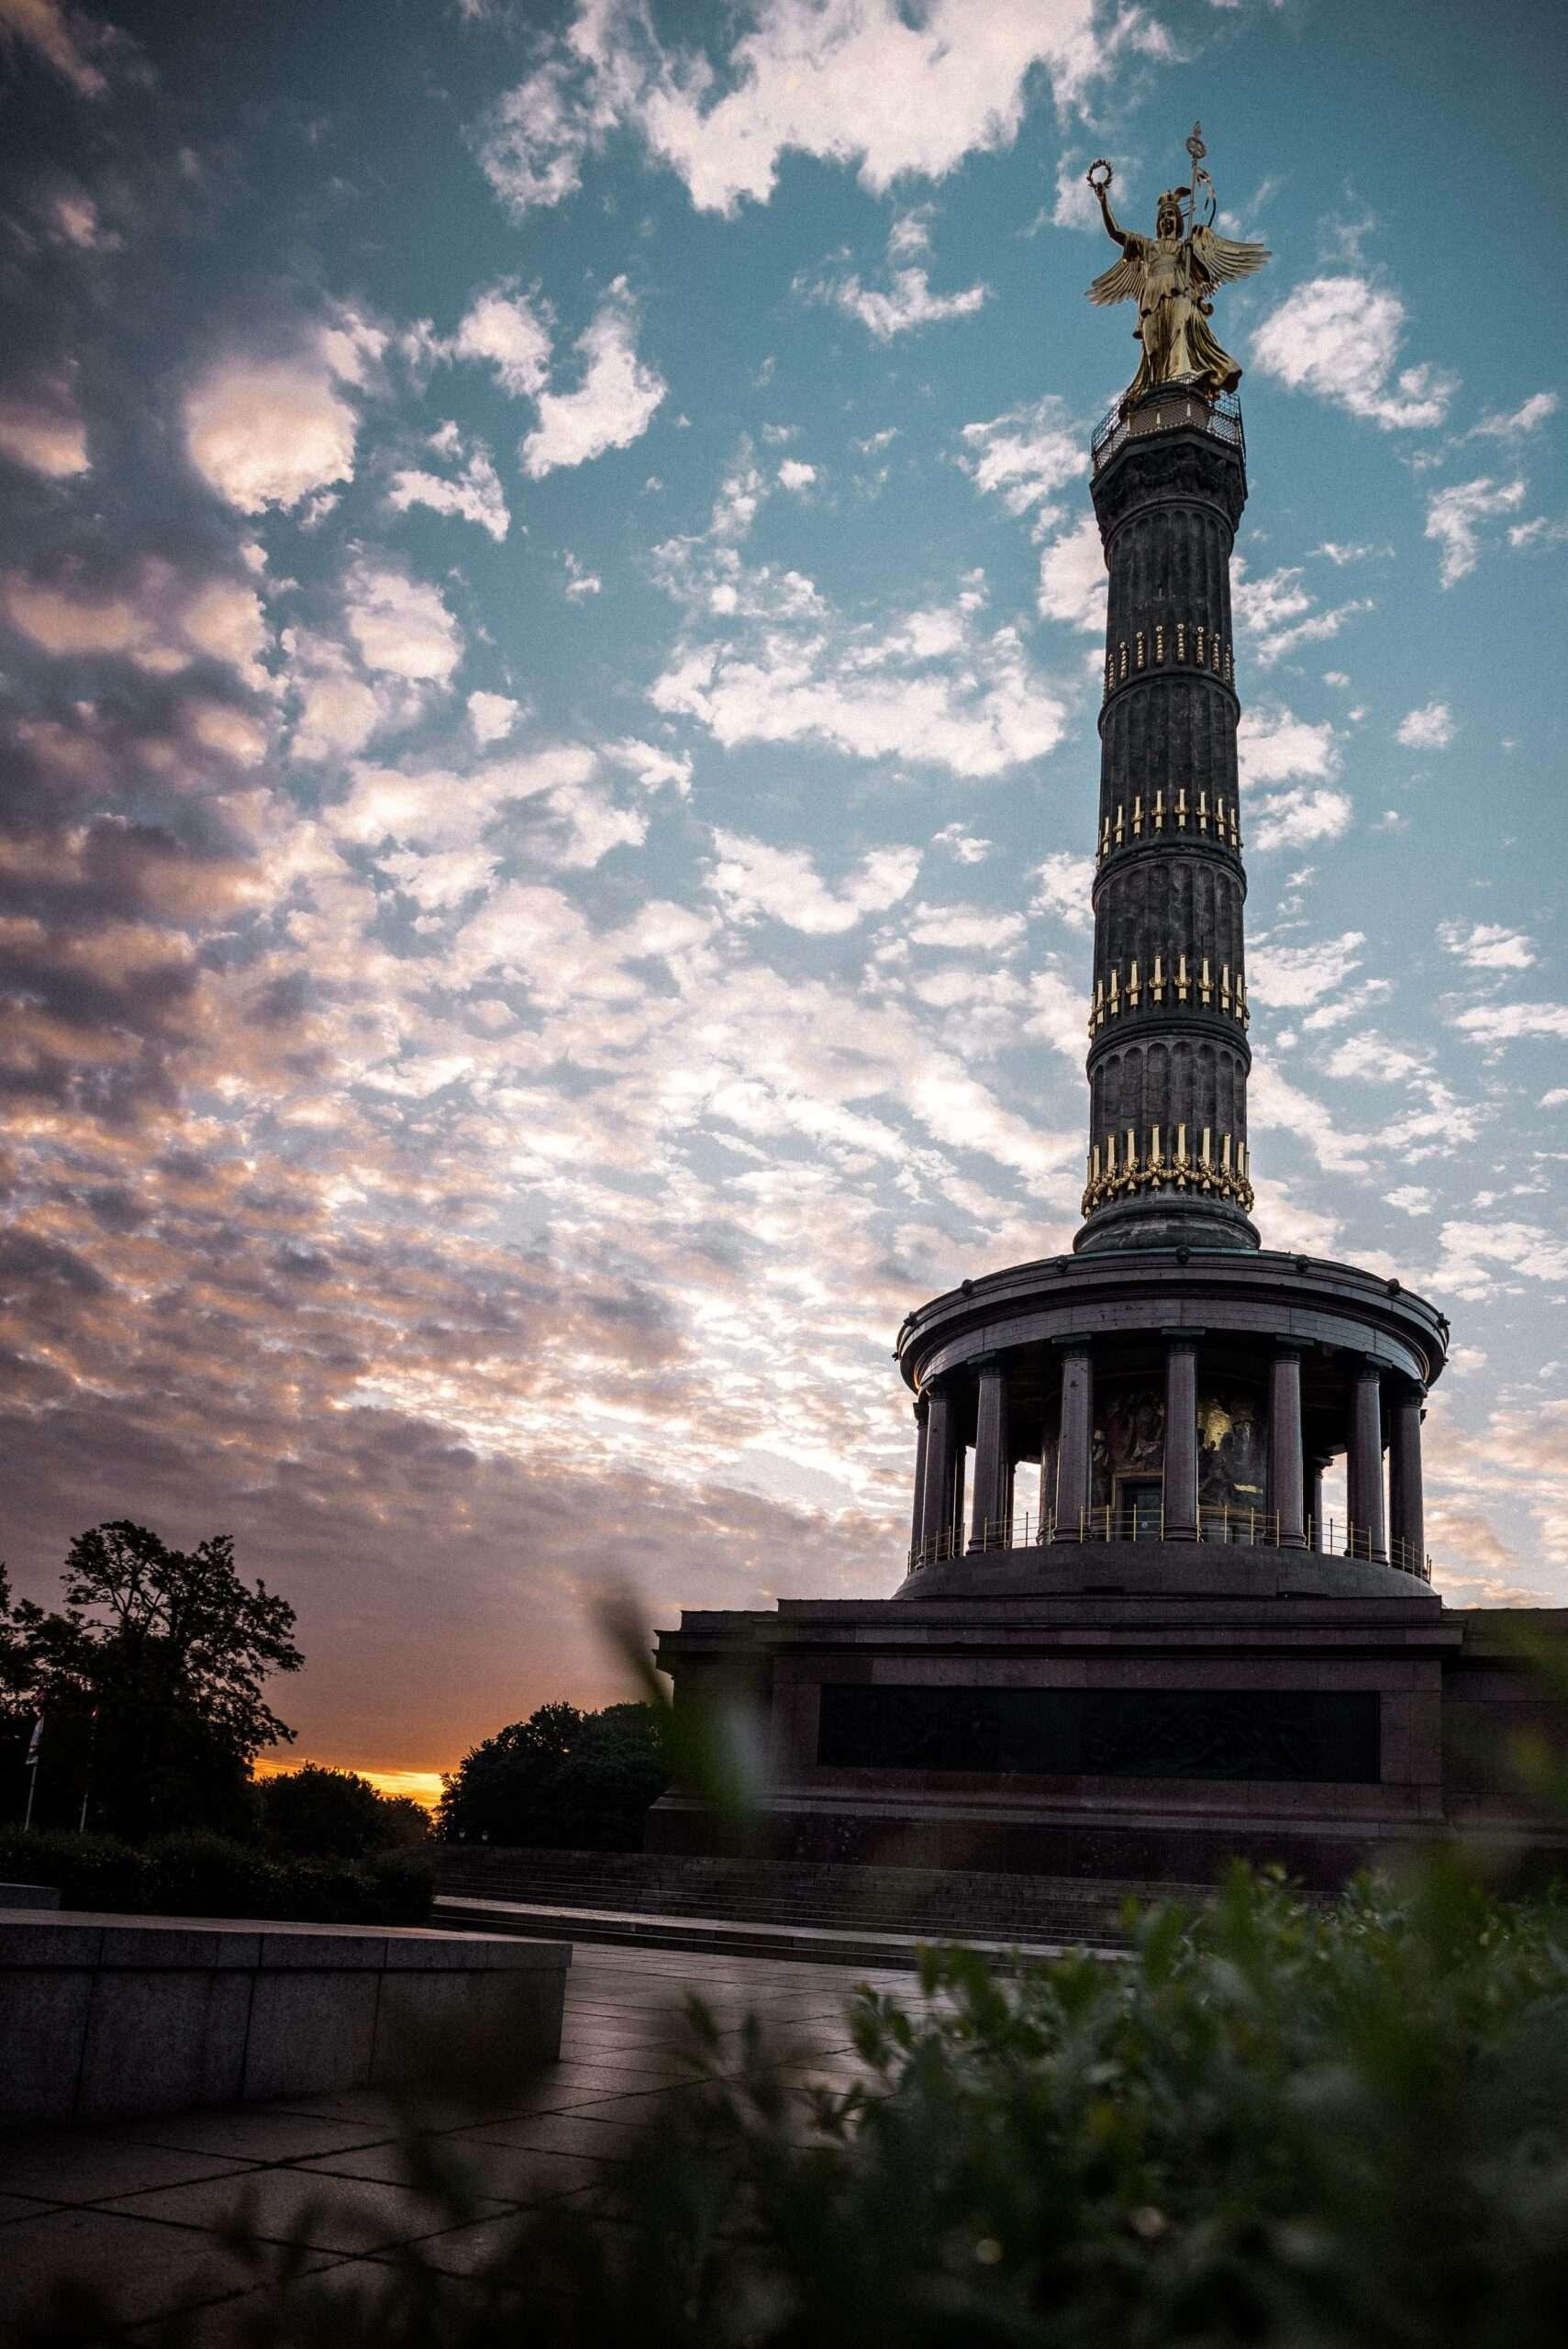 victory column at sunset, Berlin